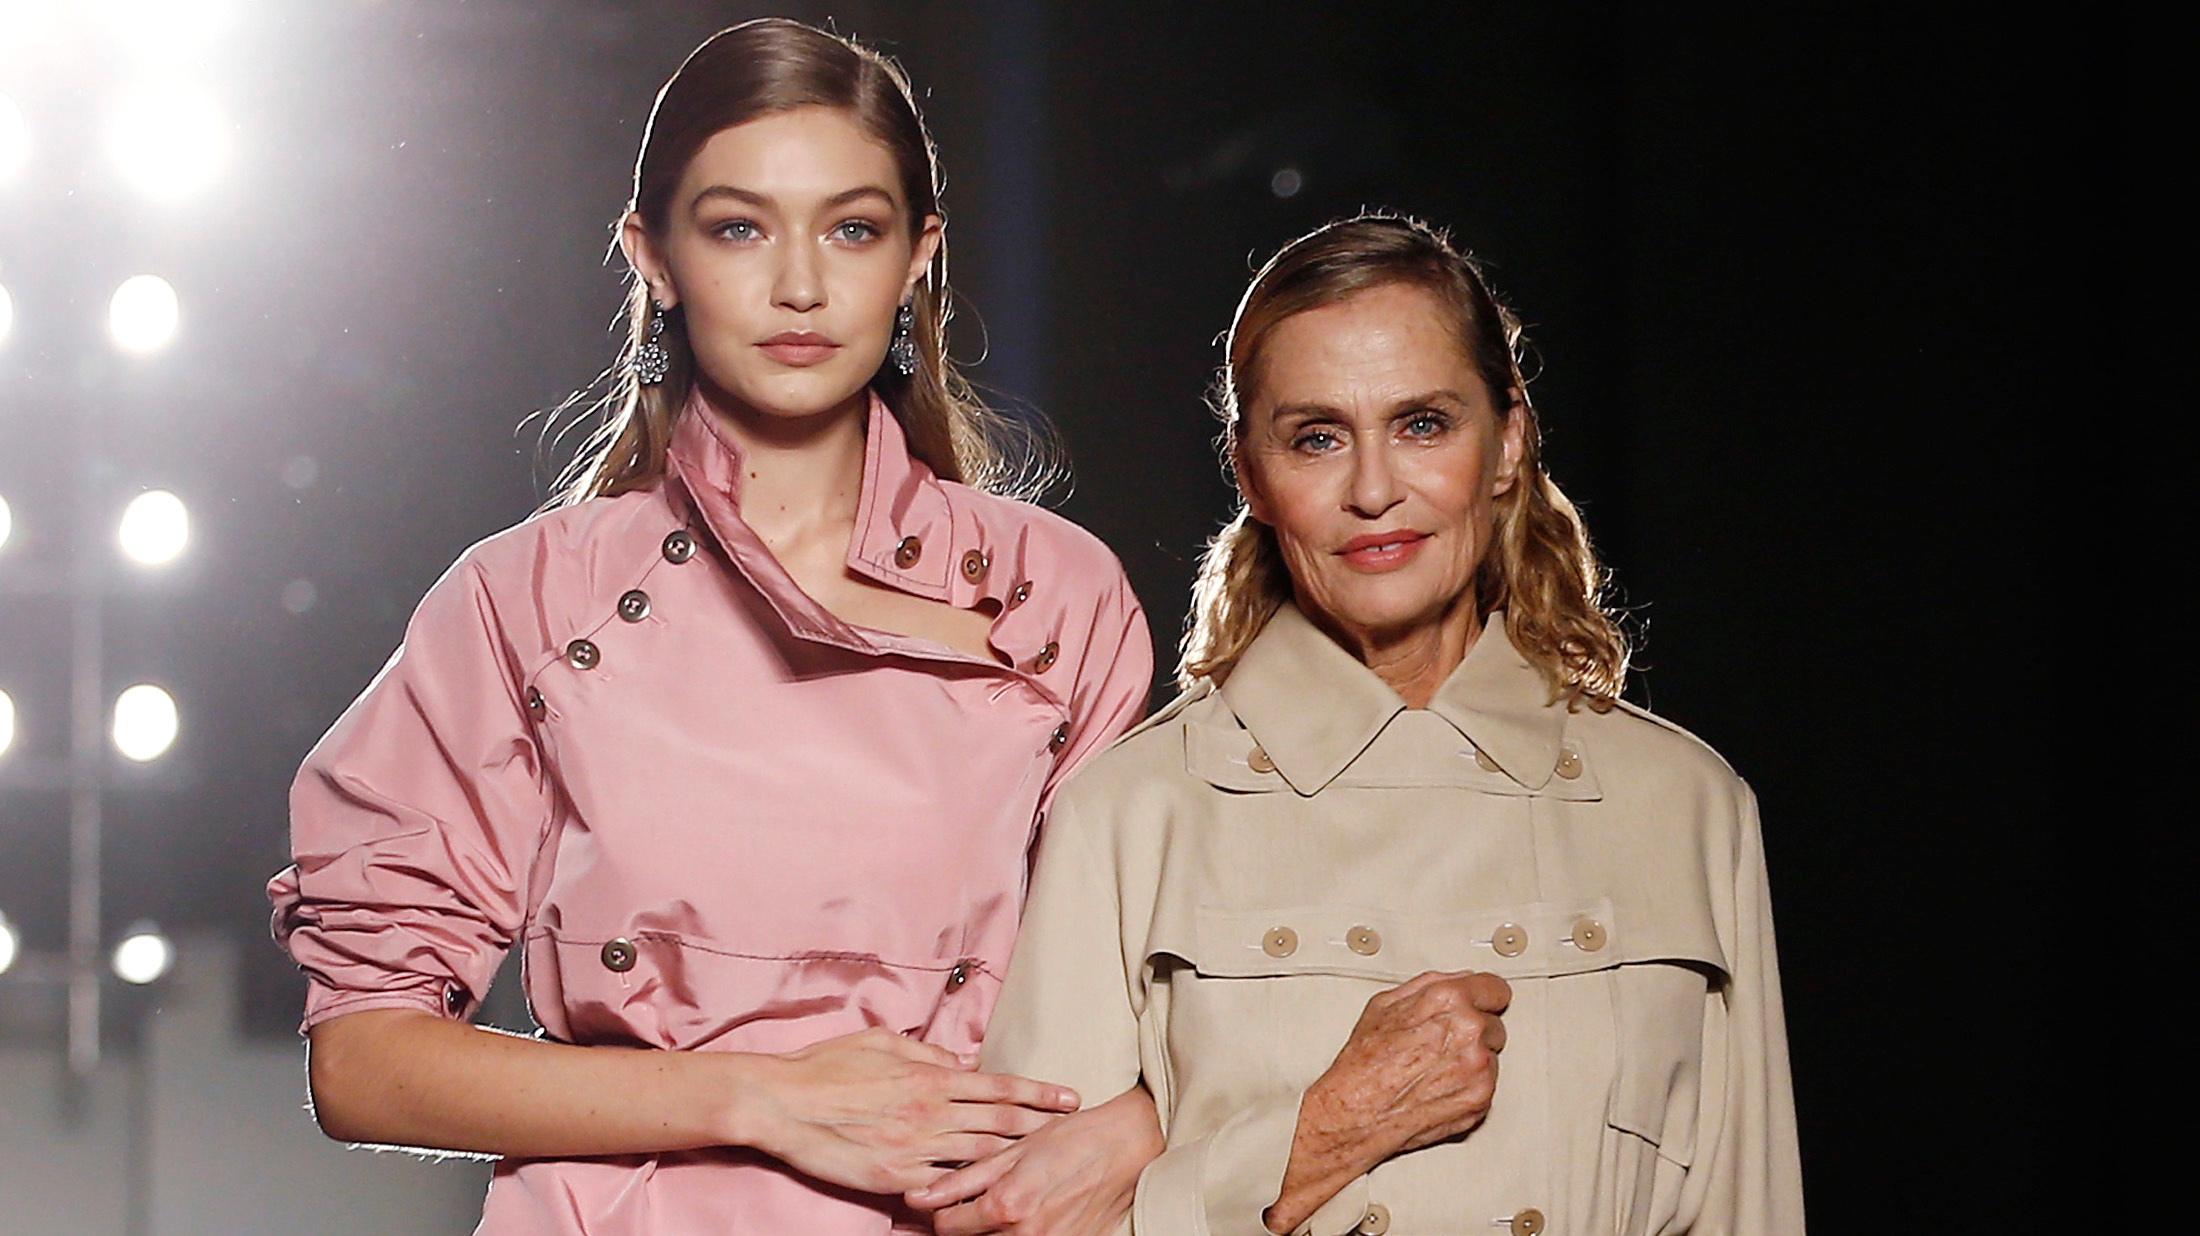 Models Gigi Hadid (L) and Lauren Hutton present creations at the Bottega Veneta Spring/Summer 2017 show in Milan, Italy.